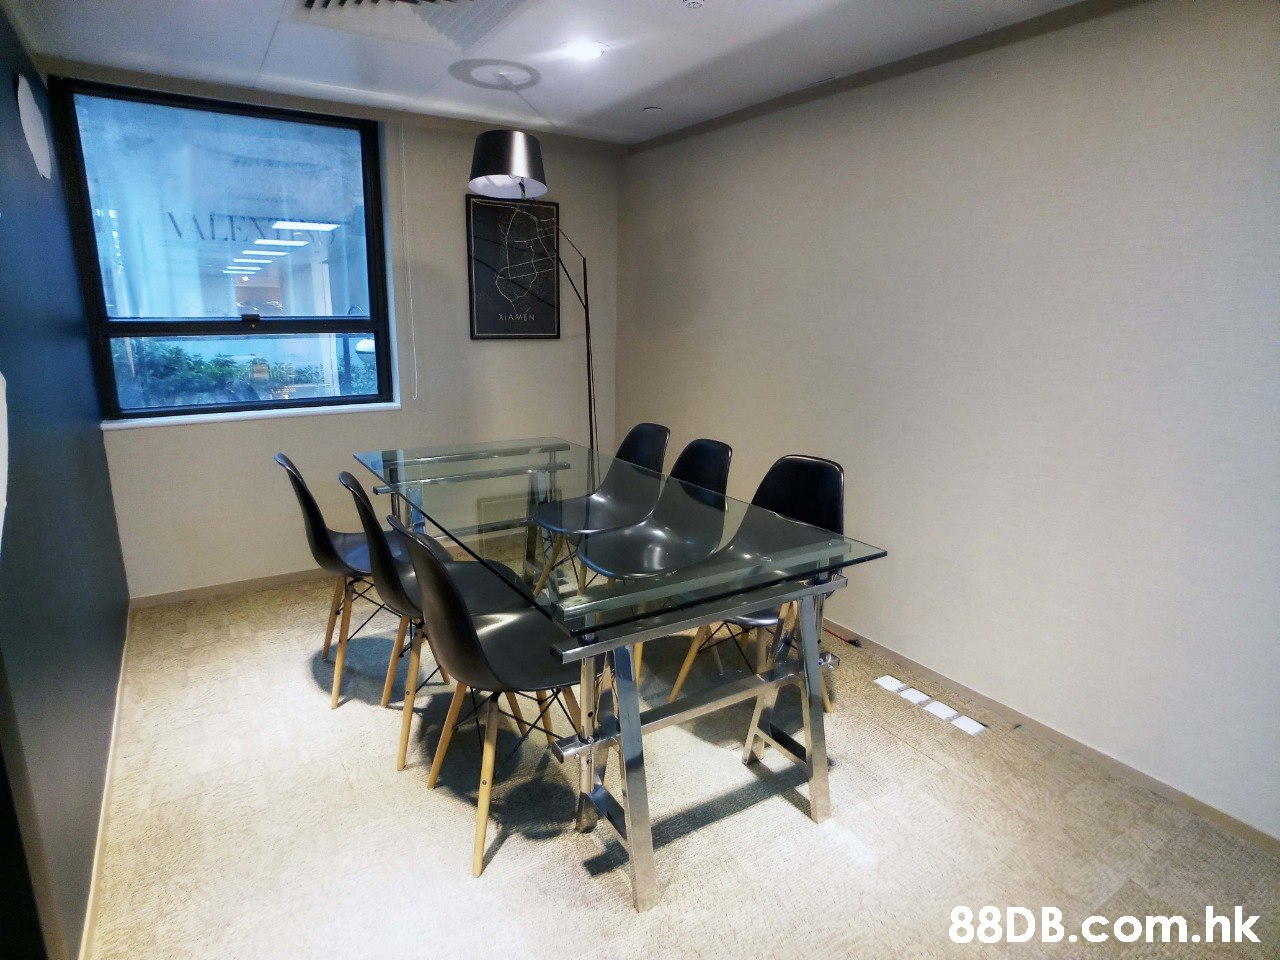 NALEXE XIAMEN .hk  Property,Room,Building,Interior design,Real estate